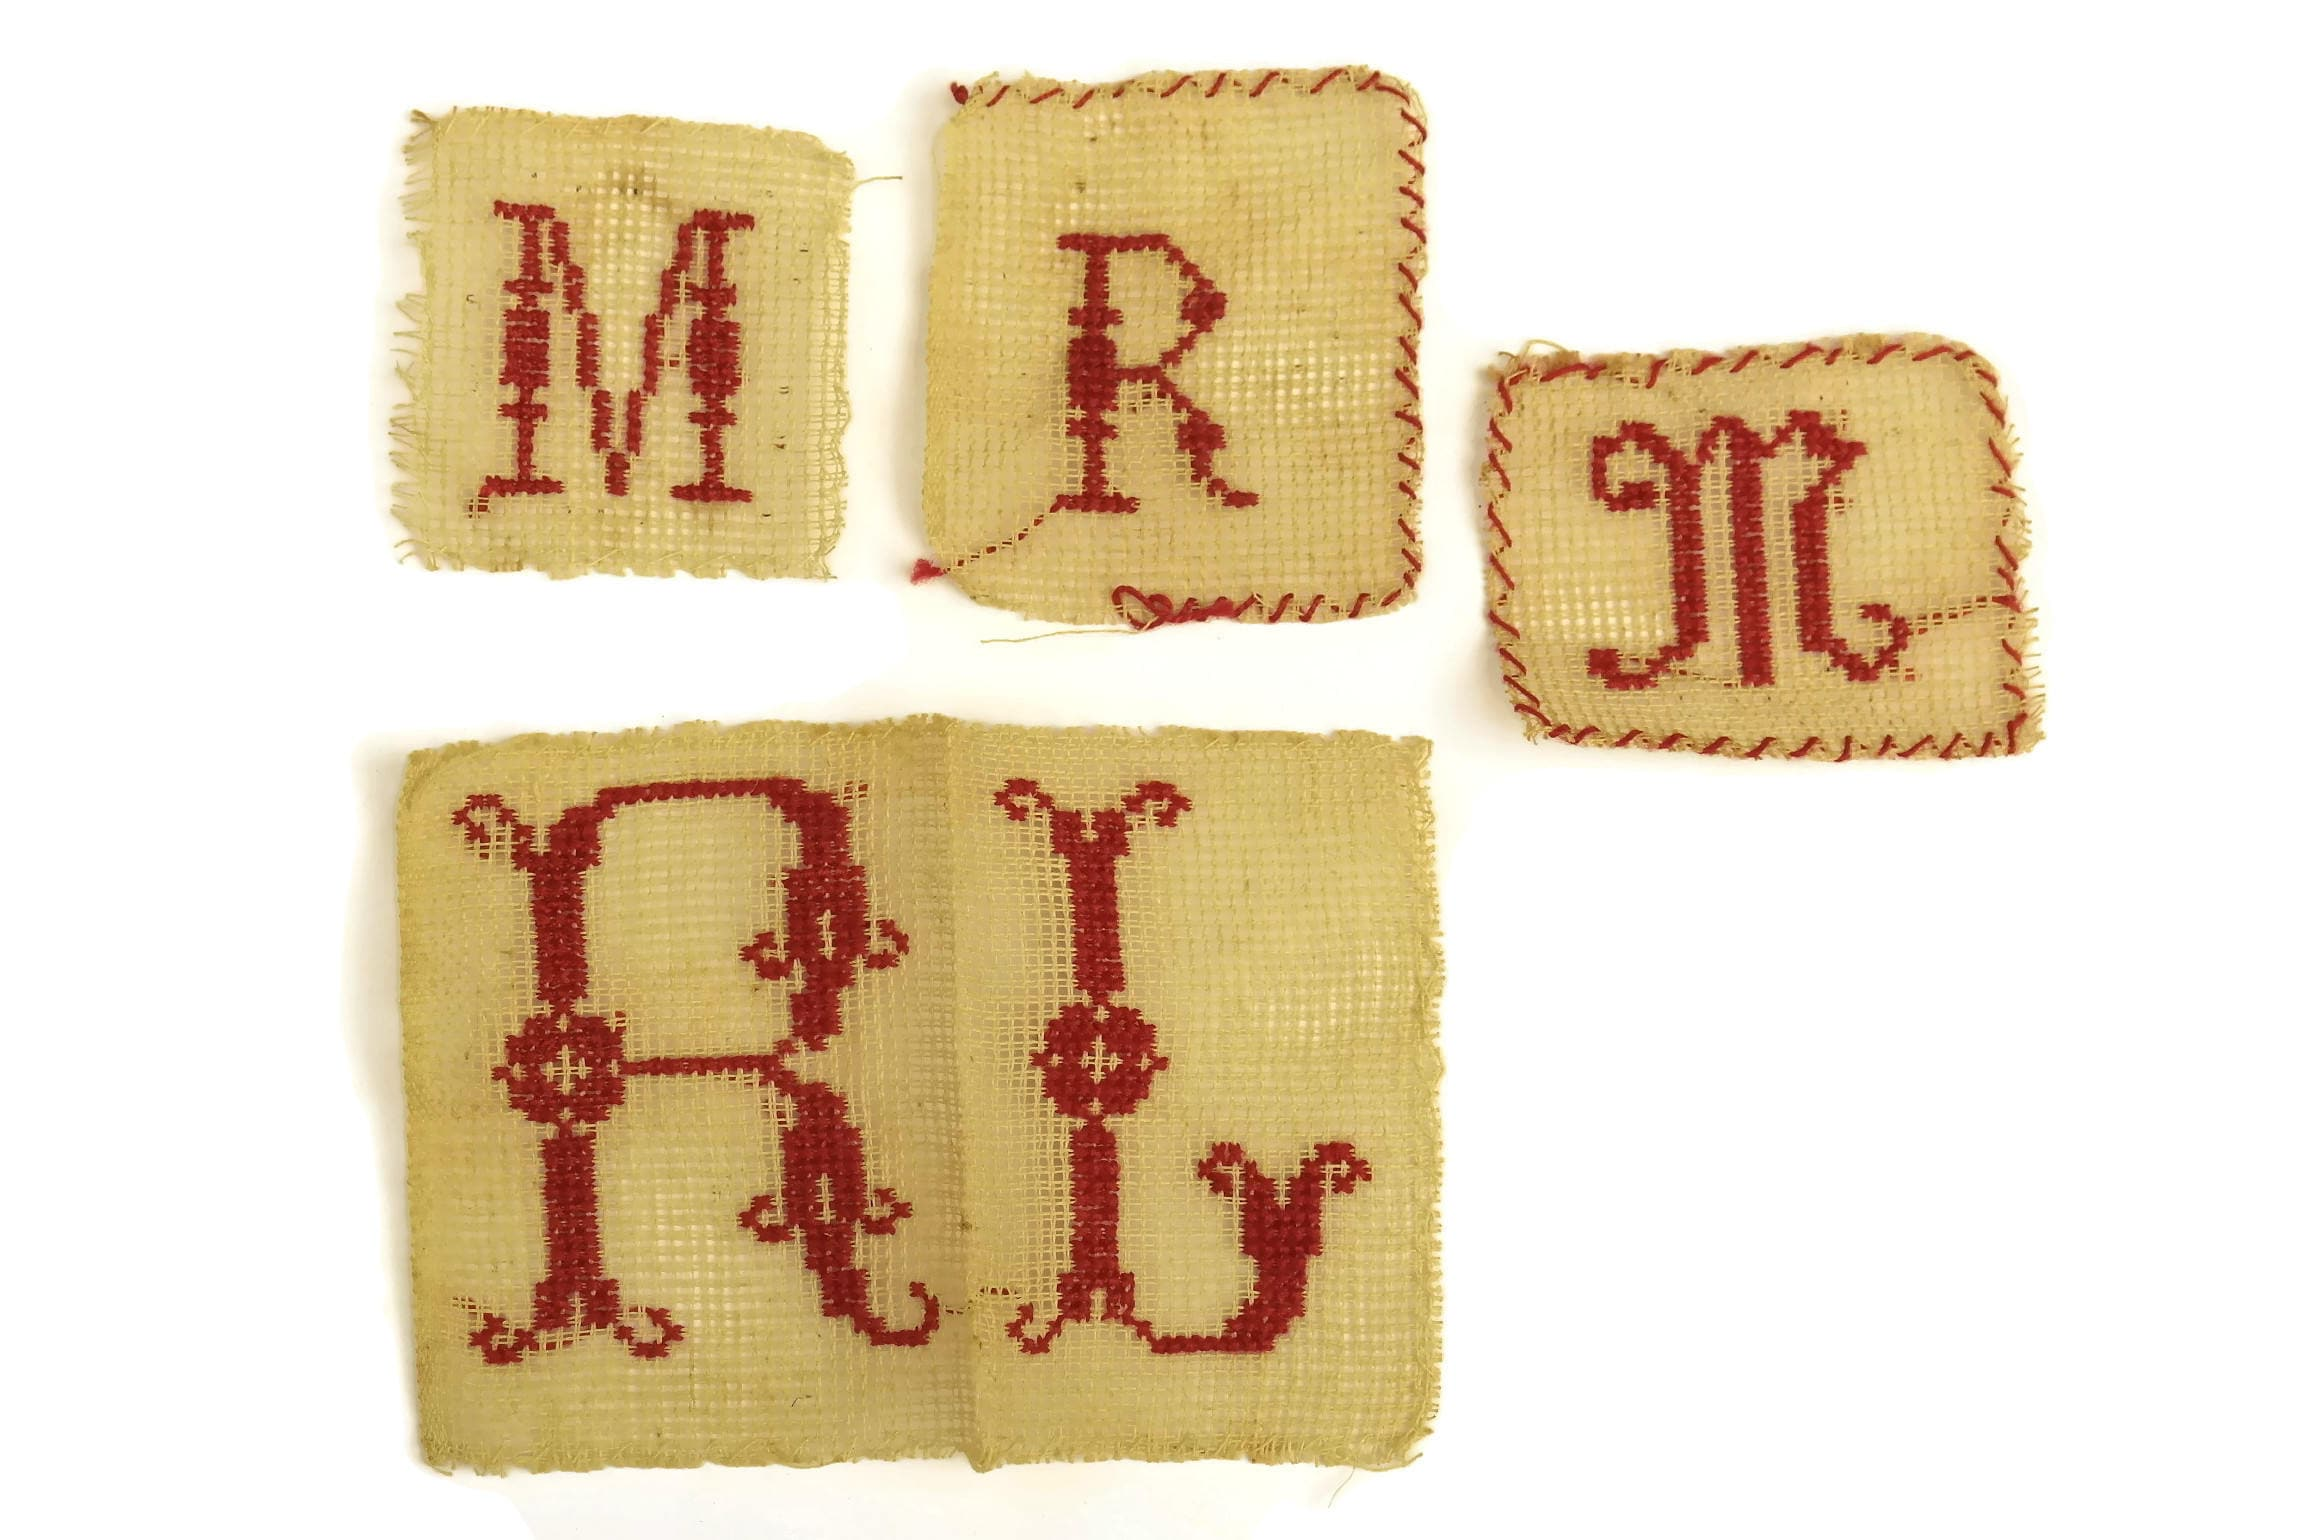 Antique Monogram Initials M R L Redwork Sampler French Cross